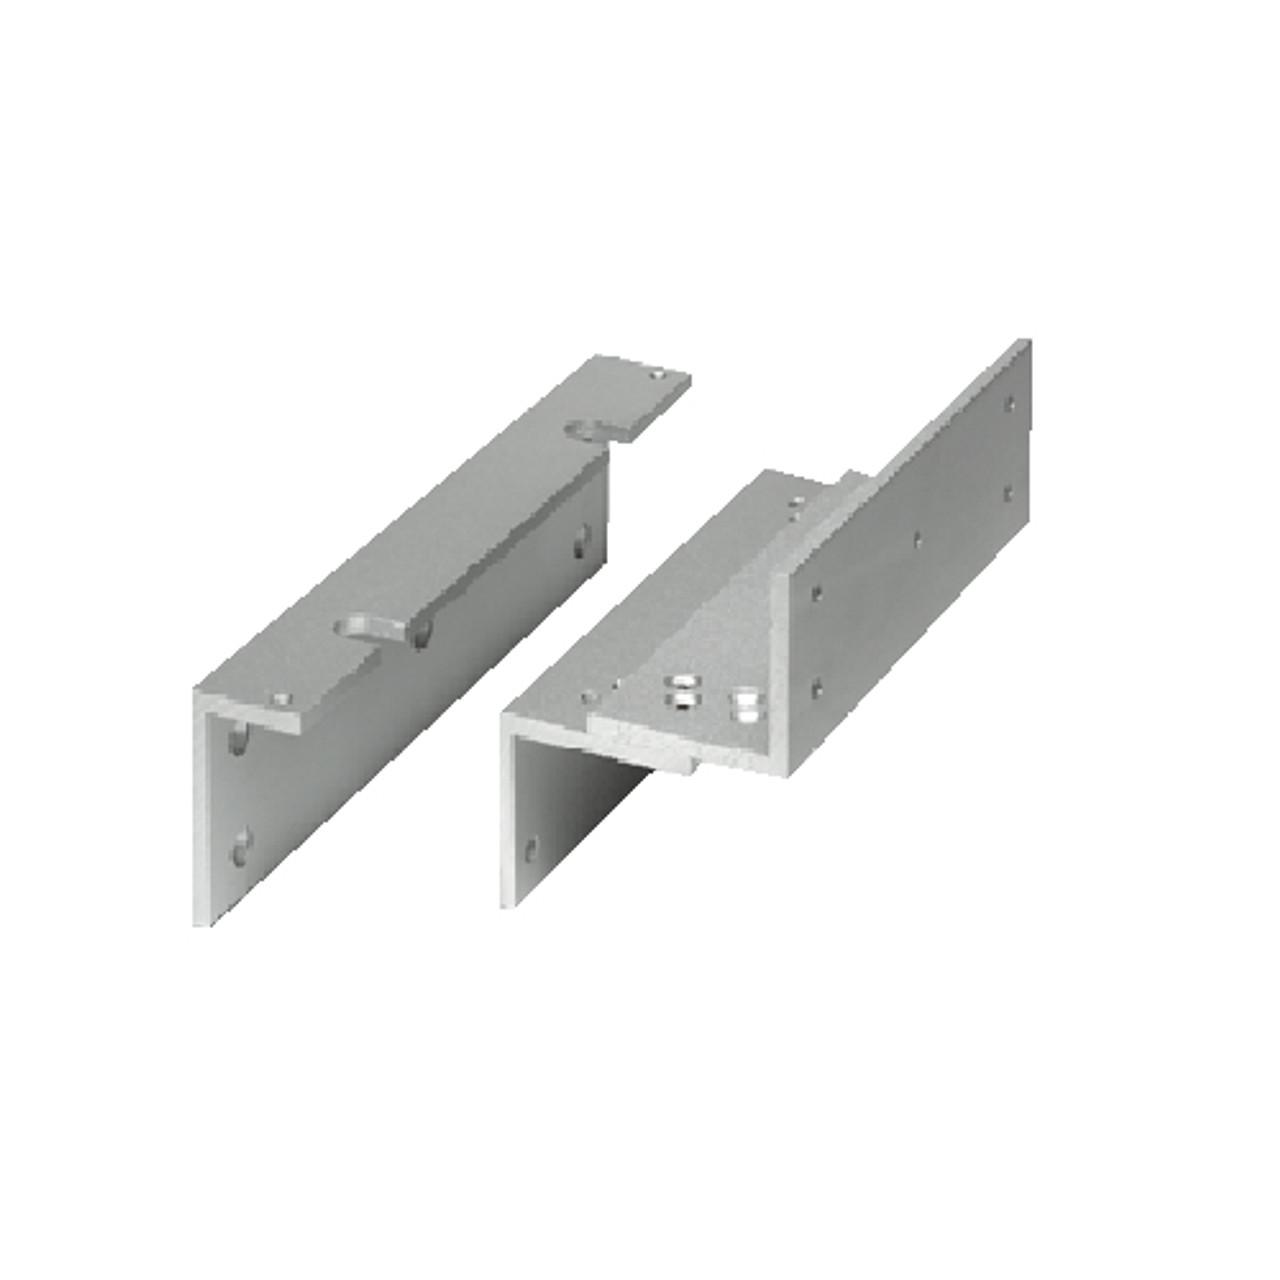 ASP-AM6370 ASP Alarm Control Three Piece Z Bracket for all 1200 Series Single Magnetic Locks